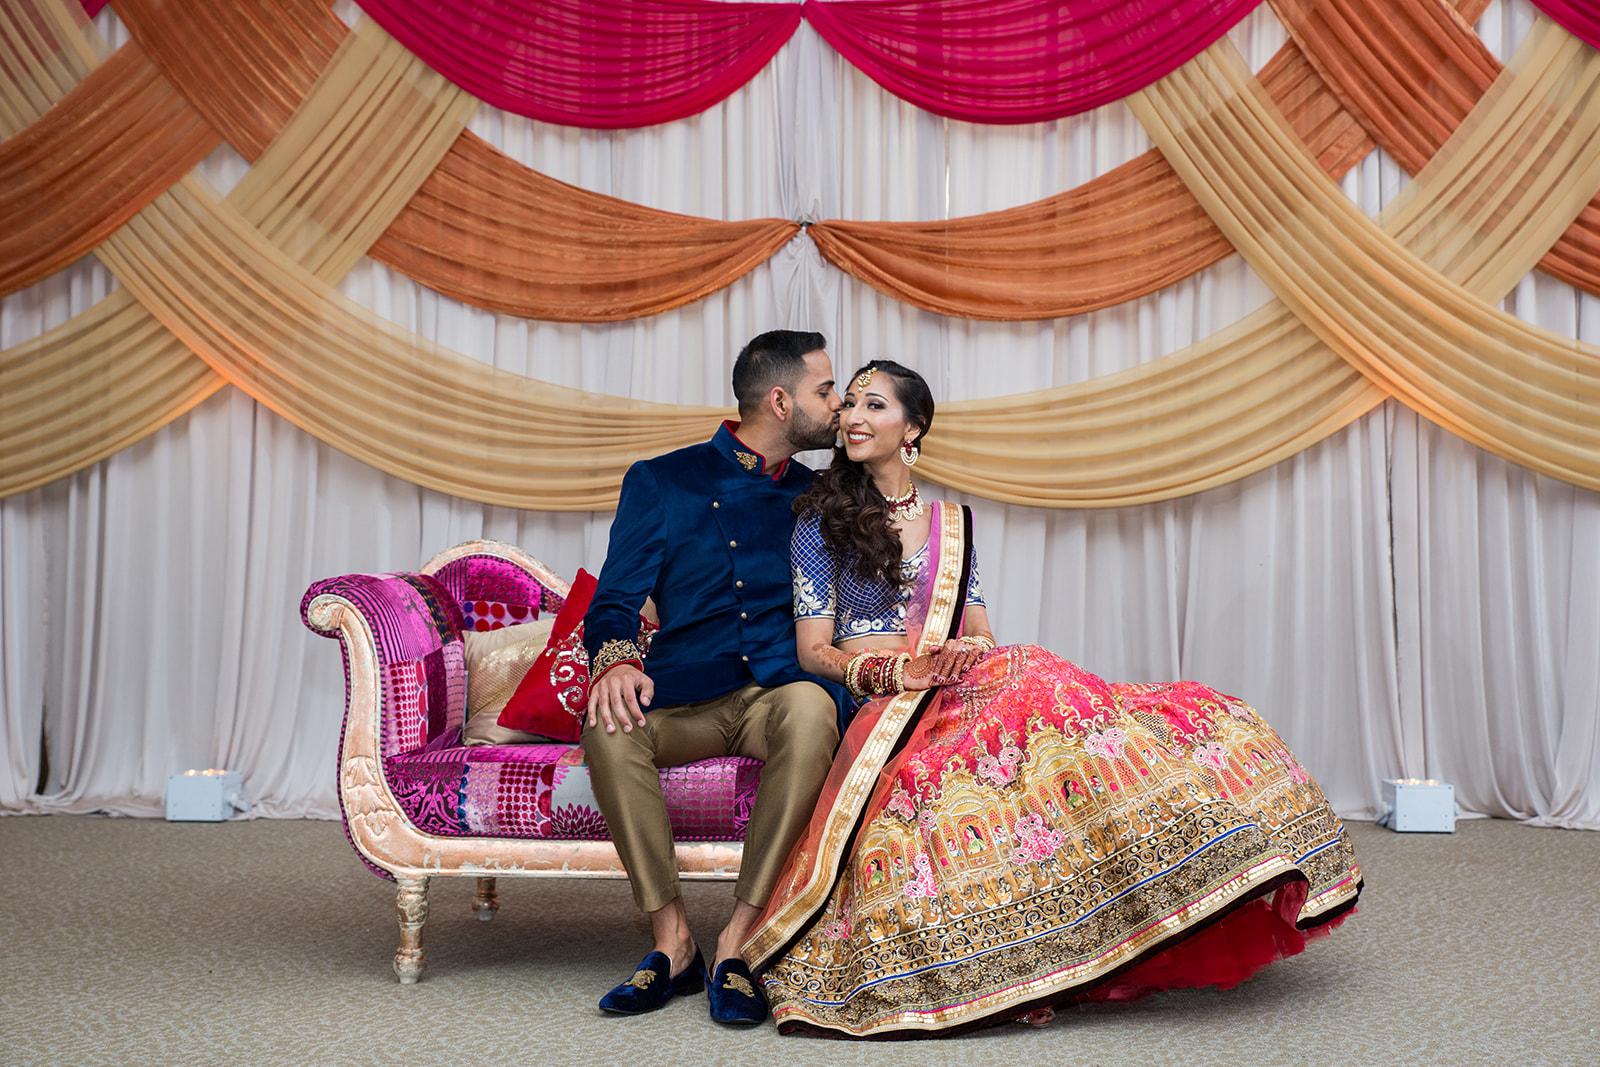 Le Cape Weddings - Puja and Kheelan - Garba A   -105.jpg